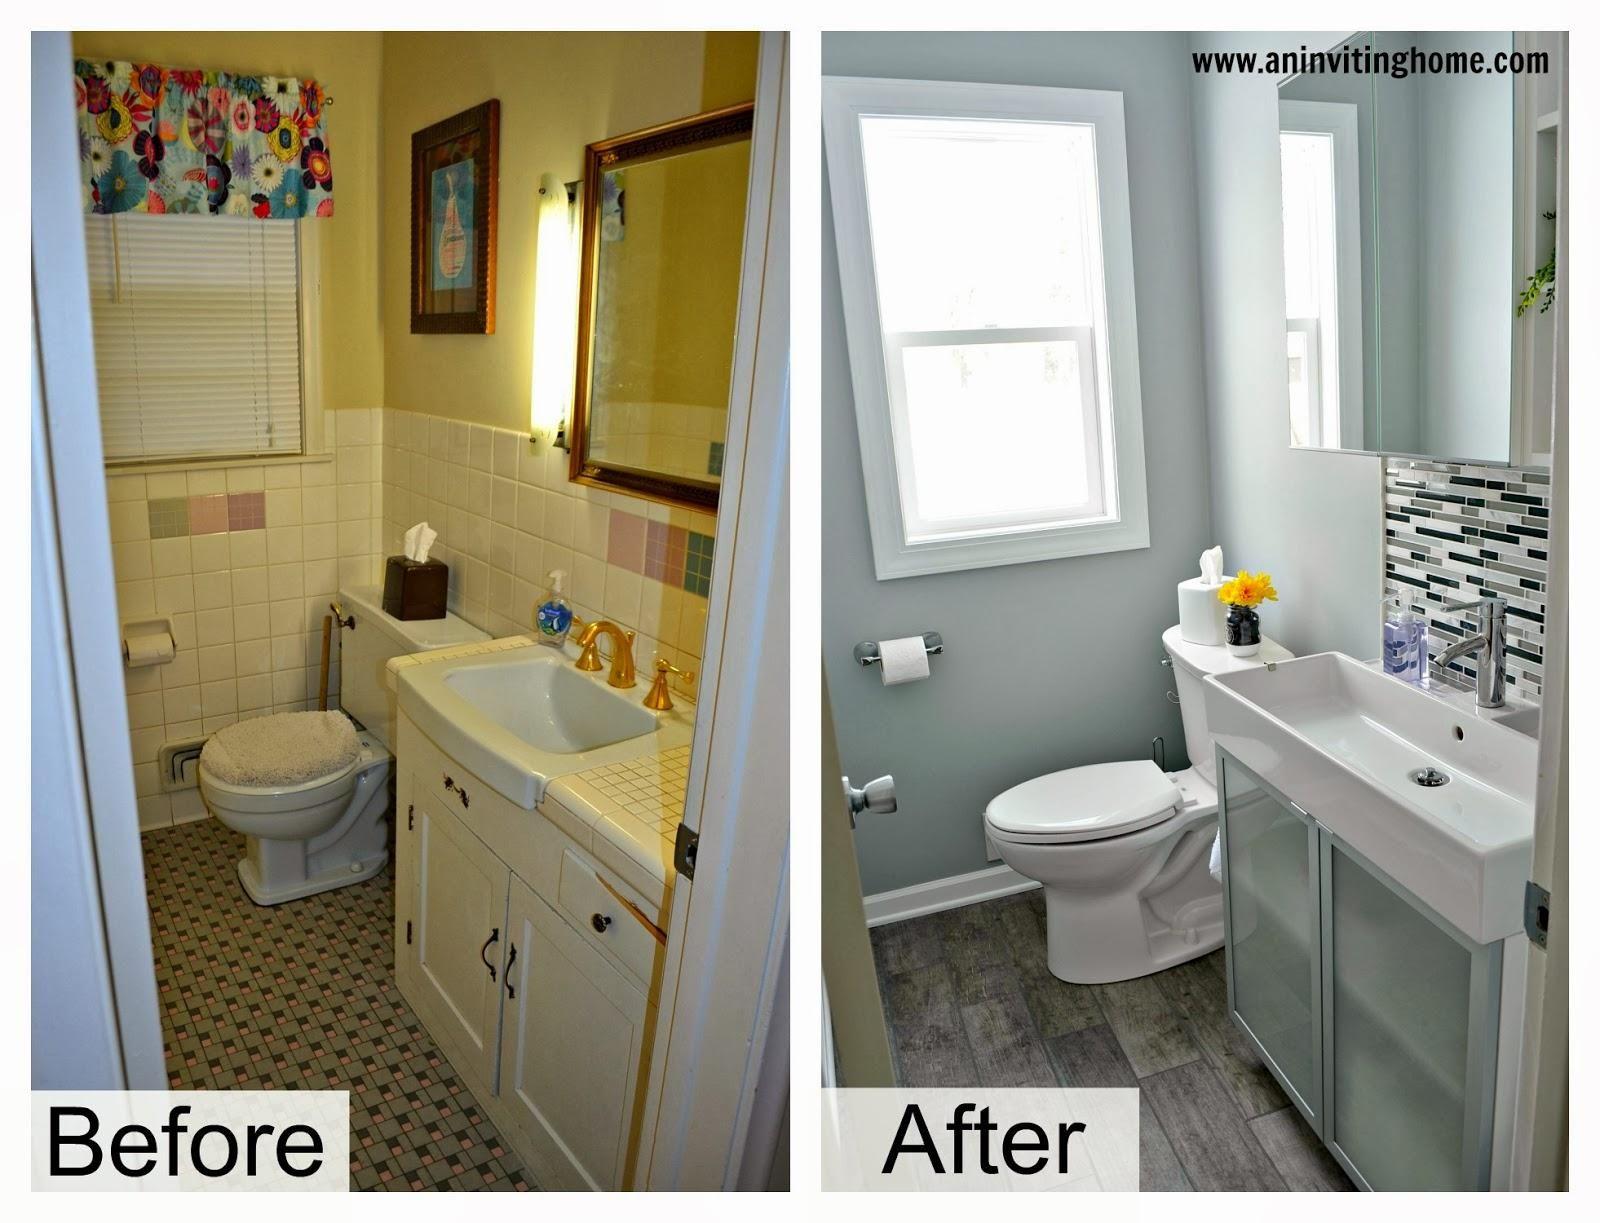 10 bathroom remodeling ideas for the home small bathroom rh pinterest com